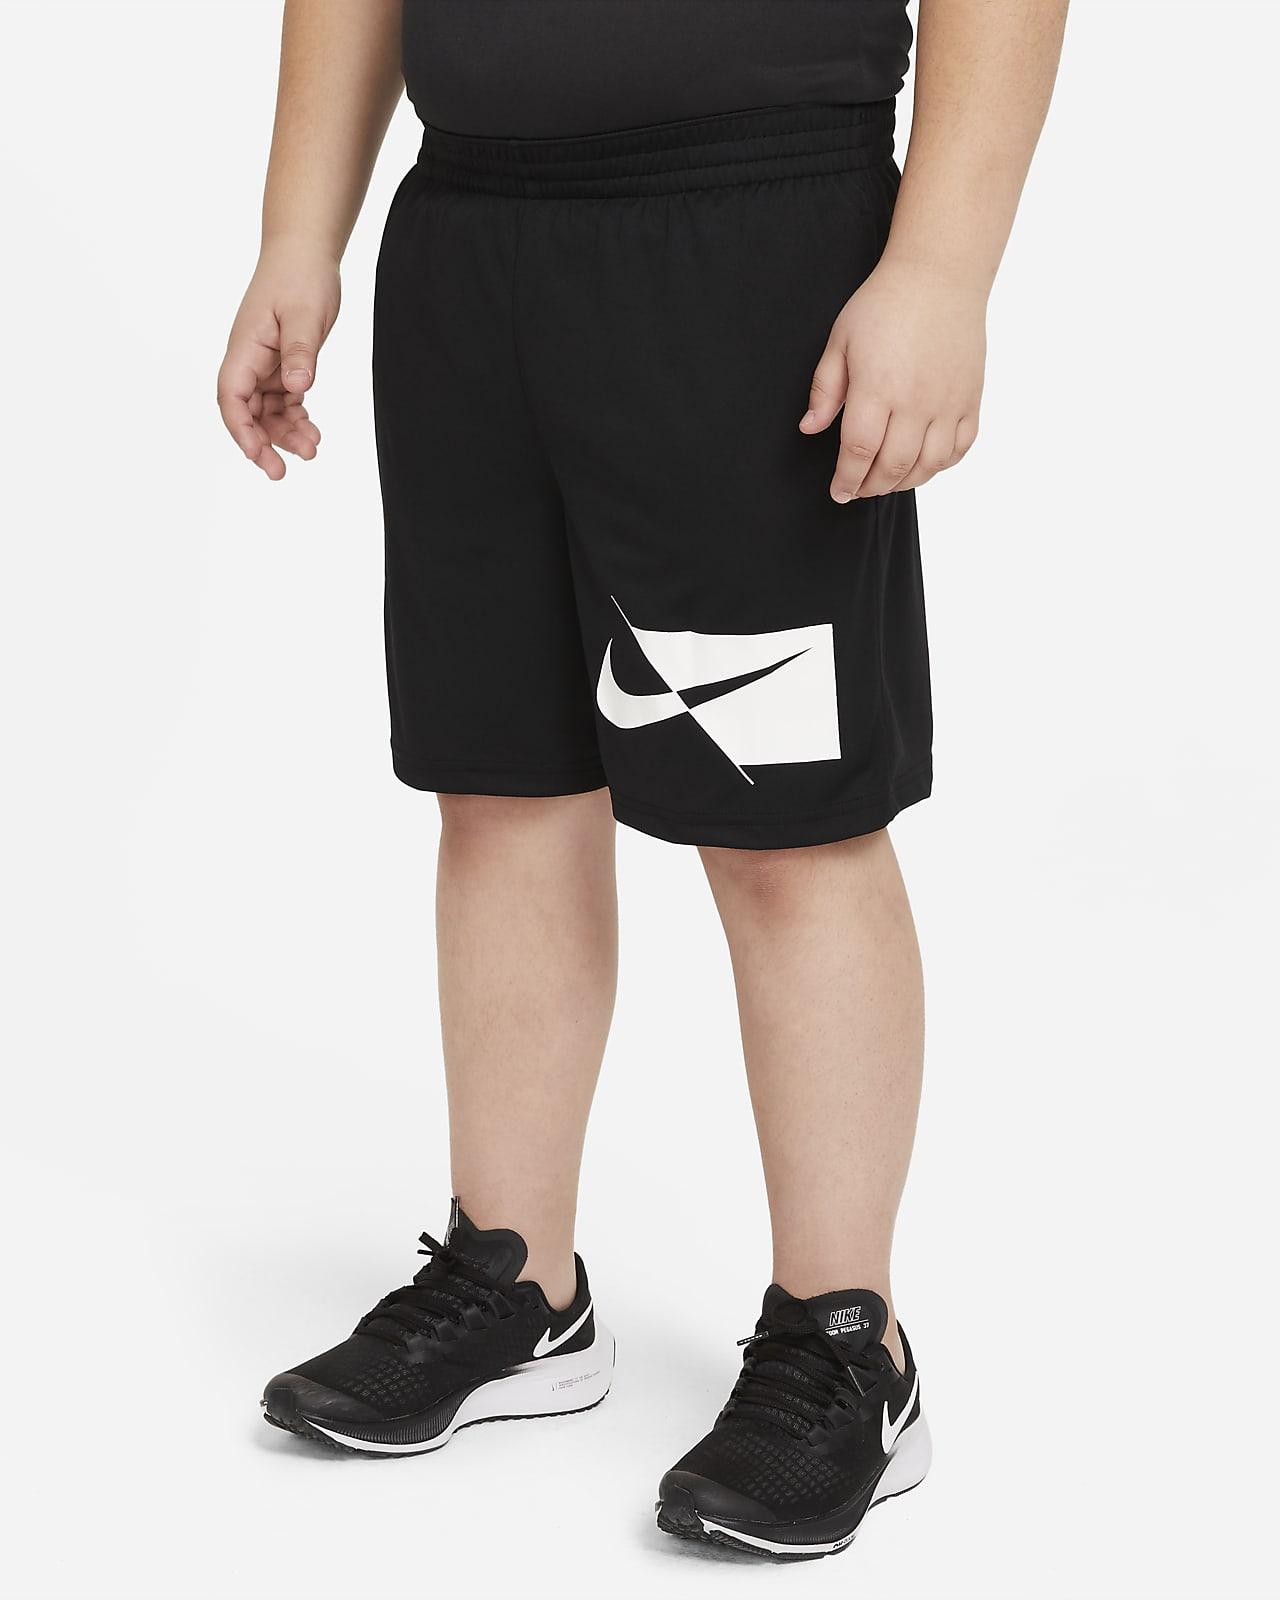 Nike Dri-FIT Older Kids' (Boys') Training Shorts (Extended Size)